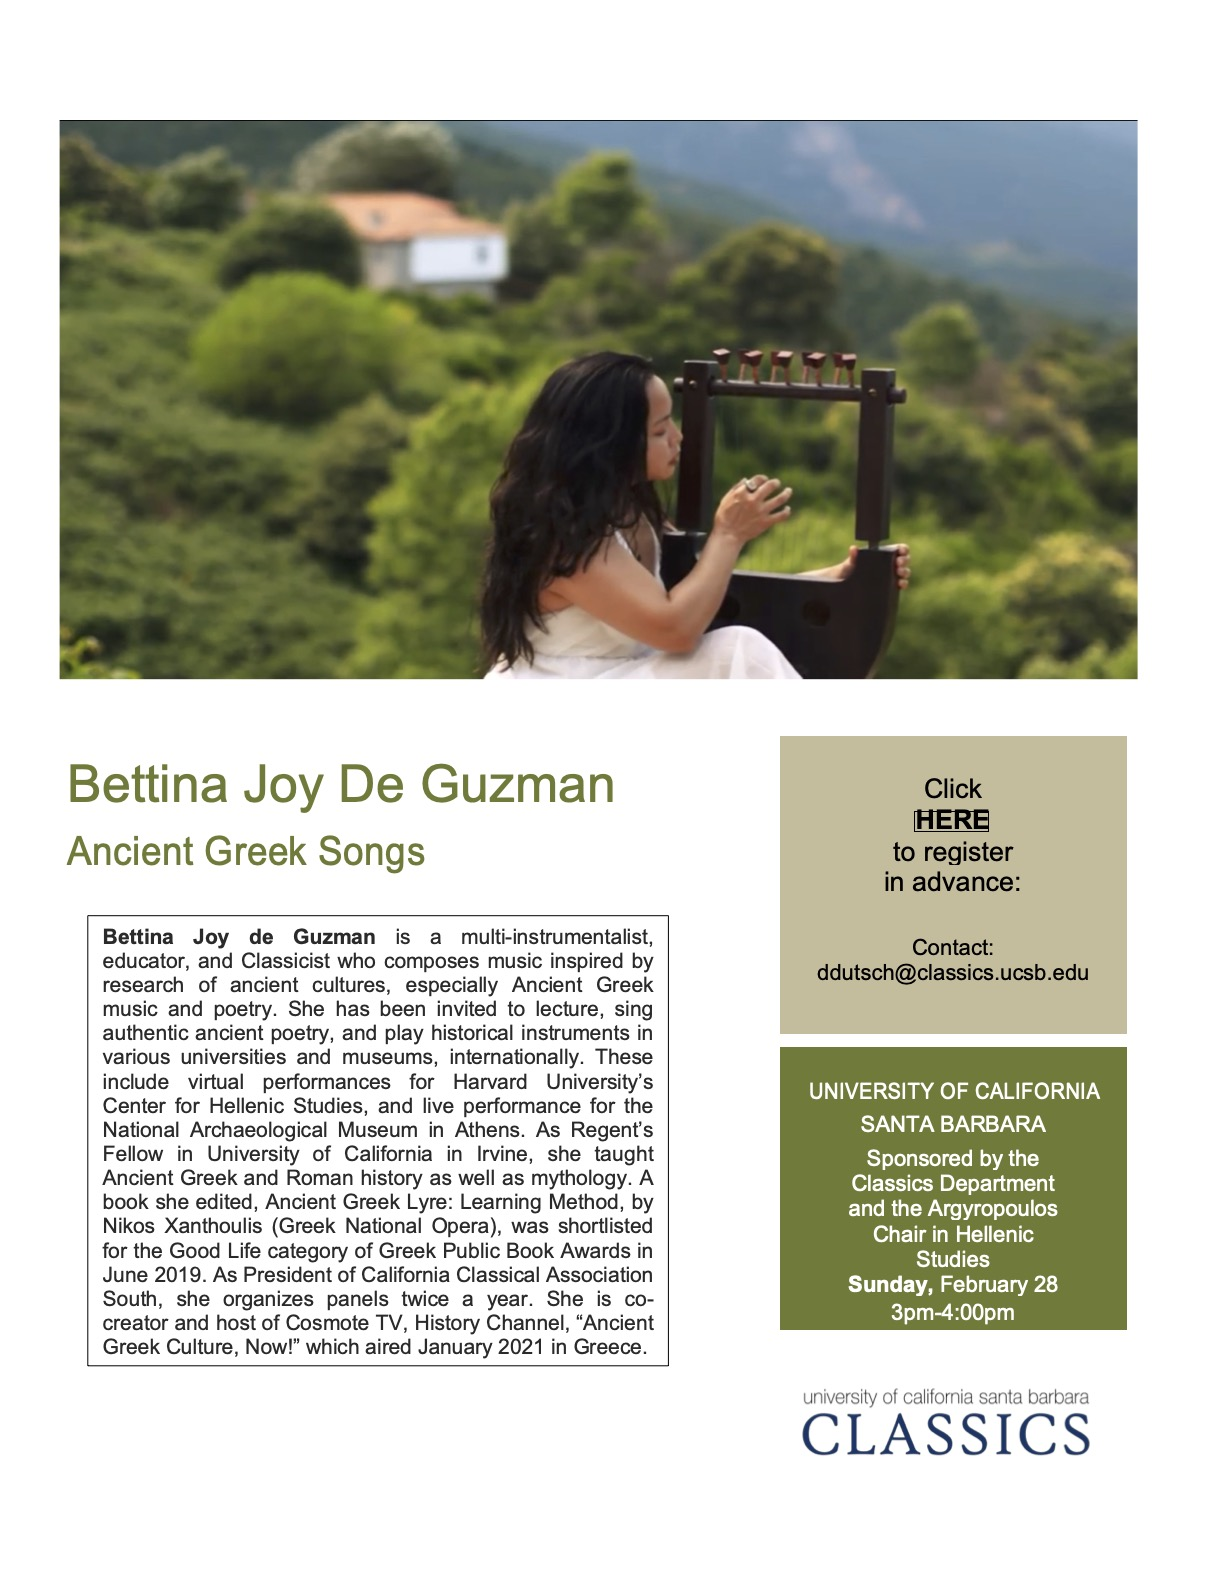 Bettina Joy de Guzman: Concert of Ancient Greek Poetry Played on a Greek Lyre